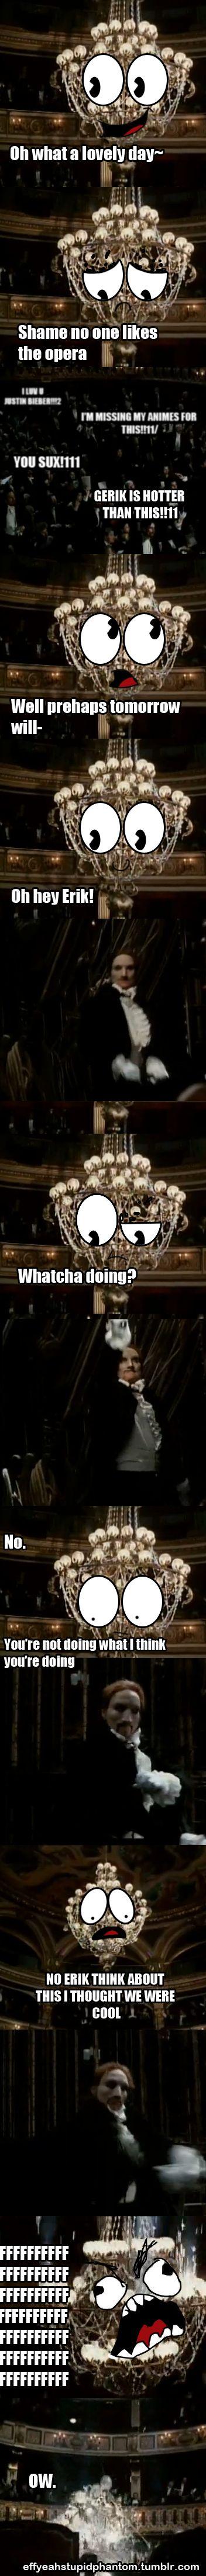 Erik / The Phantom | The Phantom of the Opera | Humor | Adaption from Arthur Kopit's Stage Production | Charles Dance